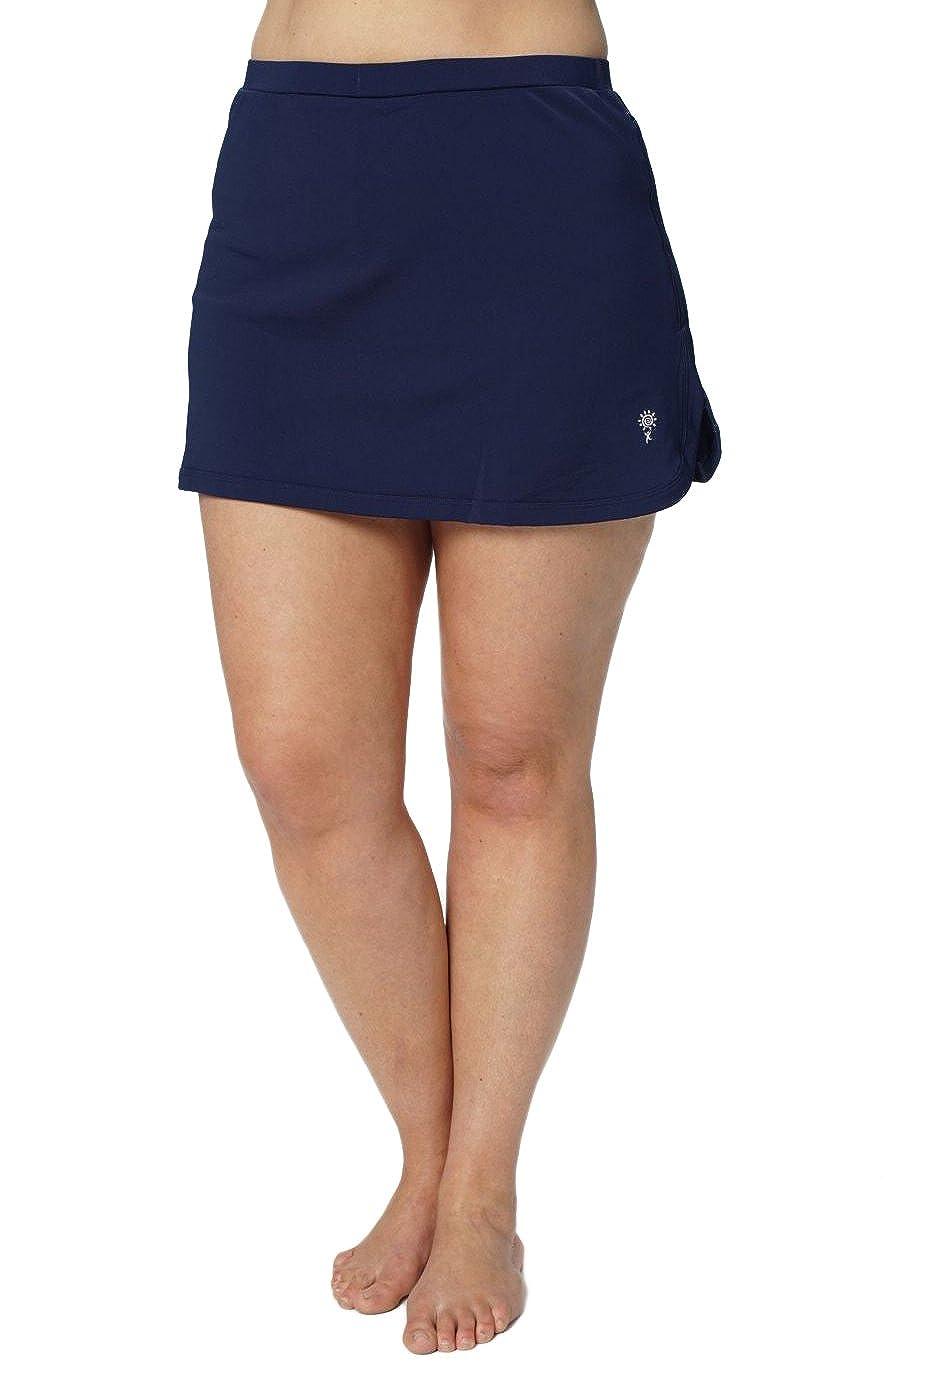 HydroChic Women's Plus Size Swim Skort – Modest Skirtini, Swimsuit Shorts Skirt Bikini Bottom